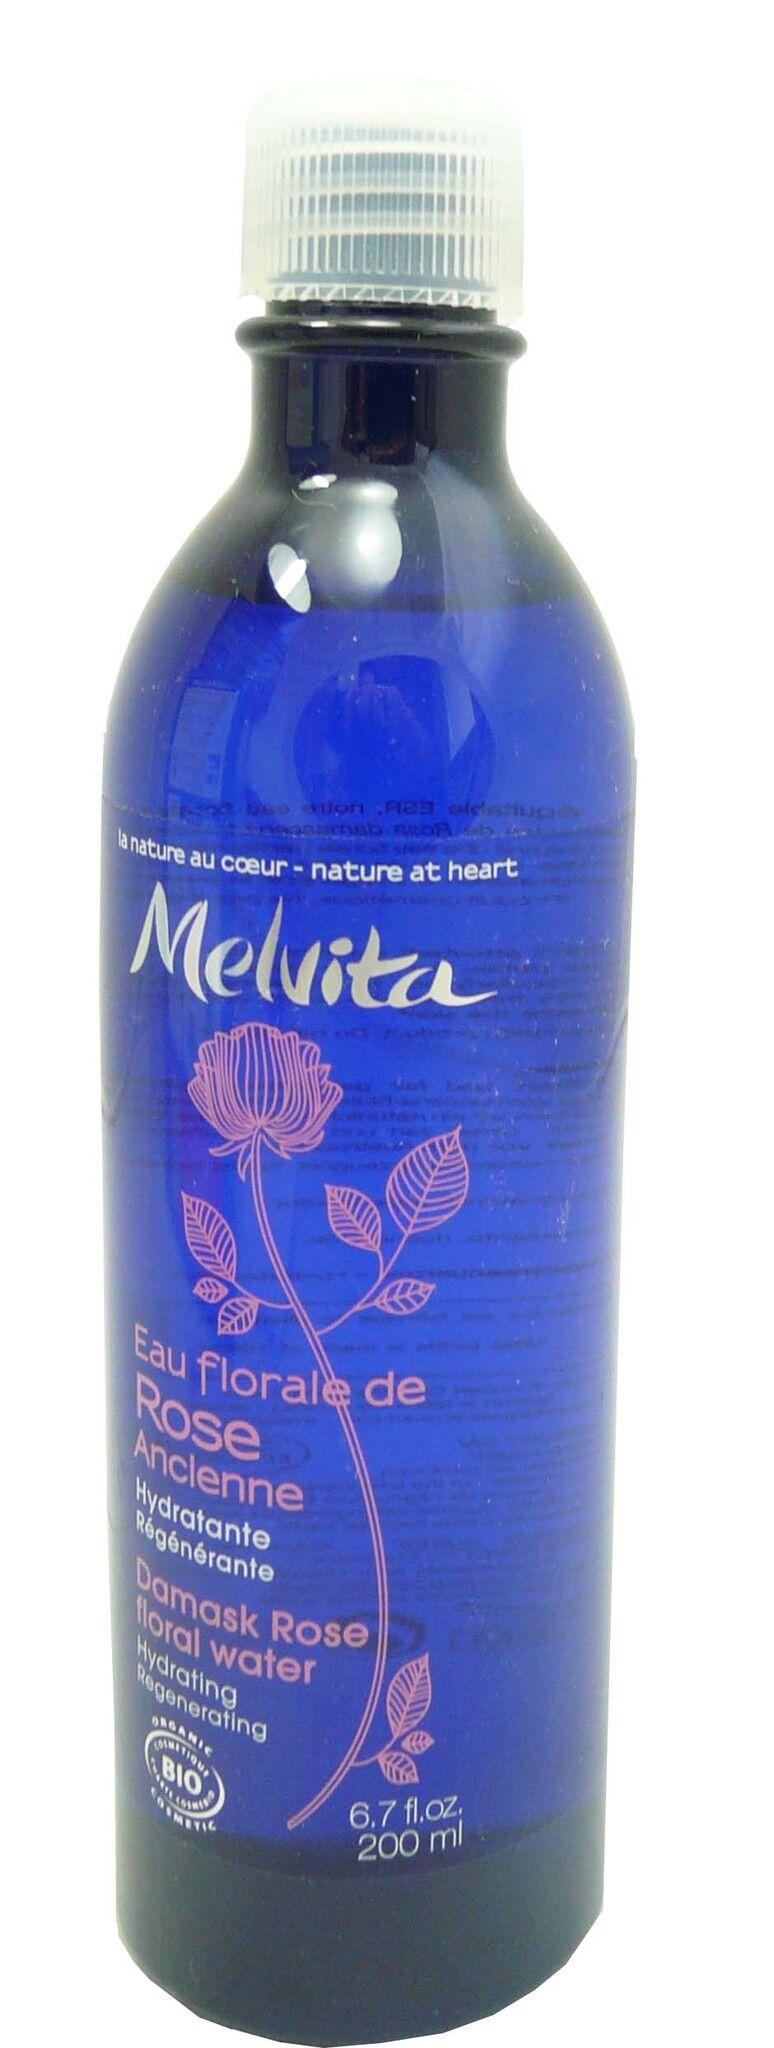 Melvita eau florale de rose 200ml